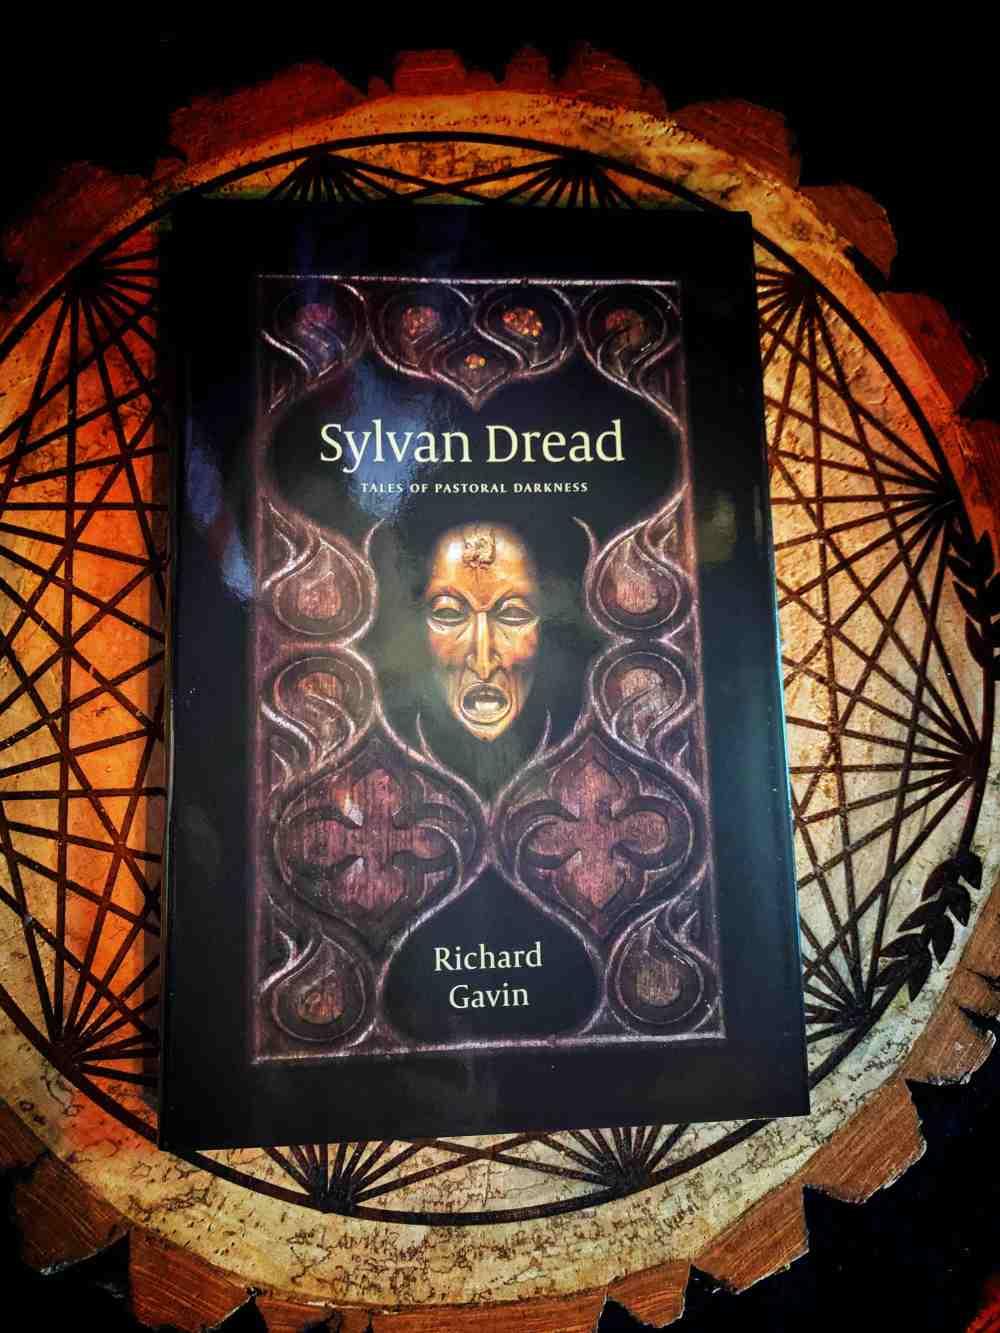 Sylvan Dread Tales of Pastoral Darkness